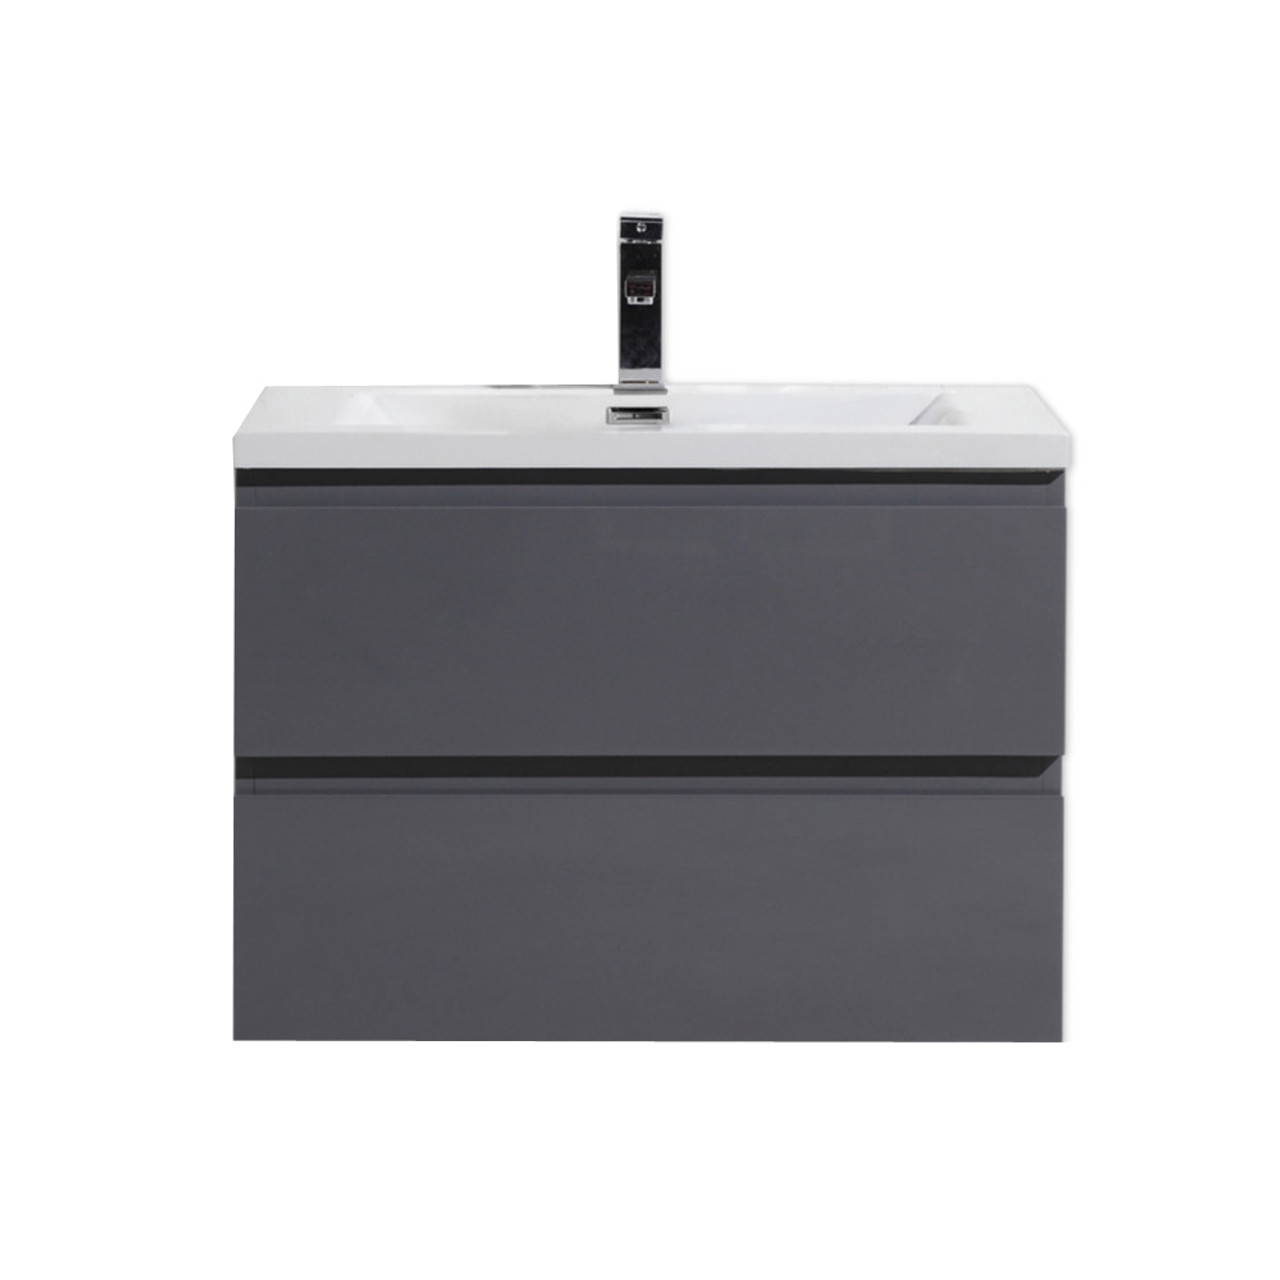 Moreno Mob 30 High Gloss Grey Wall Mounted Modern Bathroom Vanity With Reeinforced Acrylic Sink Los Angeles Vanity